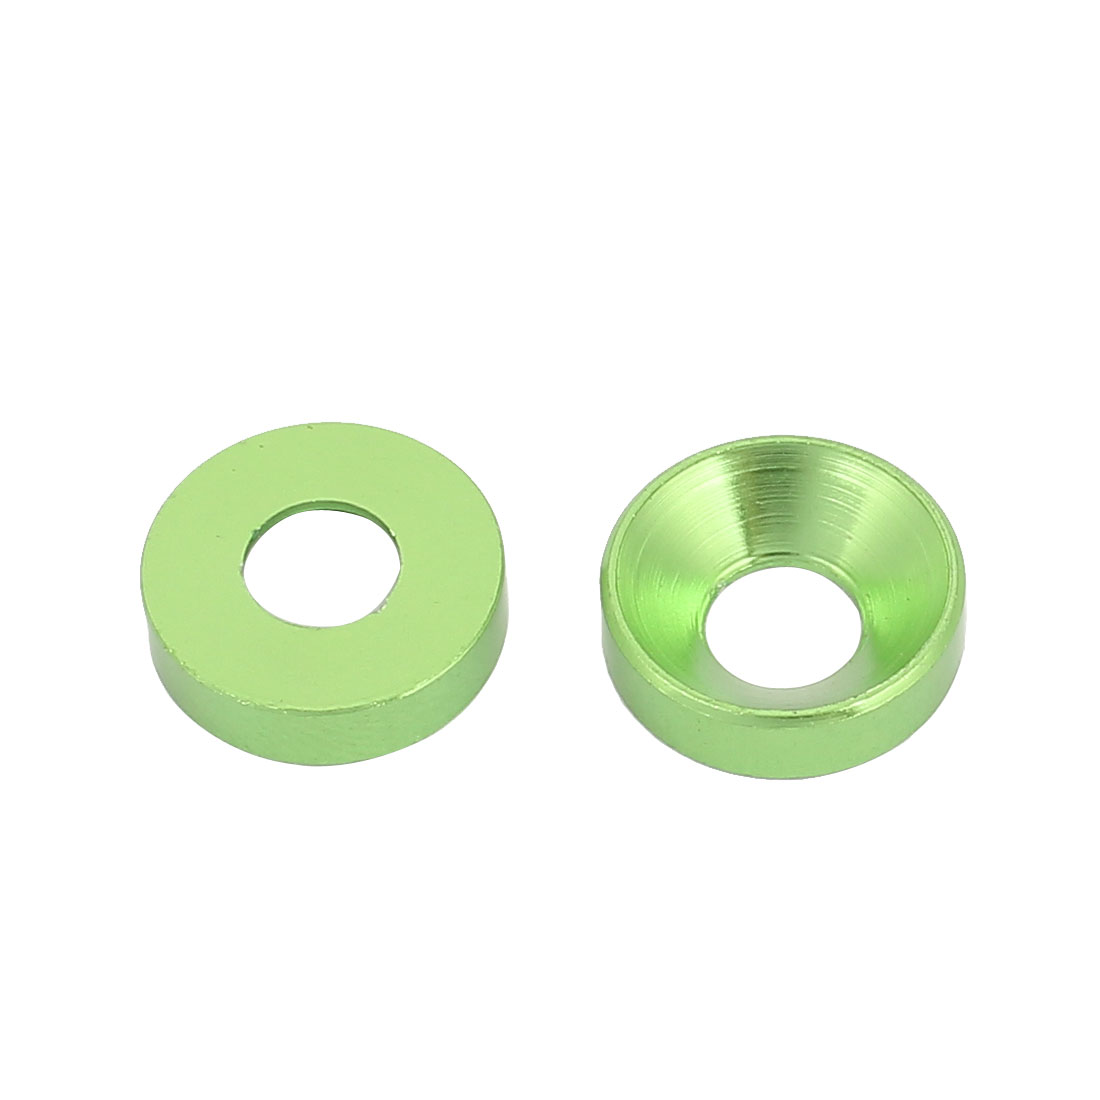 M5 Aluminum Alloy Green Countersunk Head Screw Spacer For RC DIY 2 Pcs